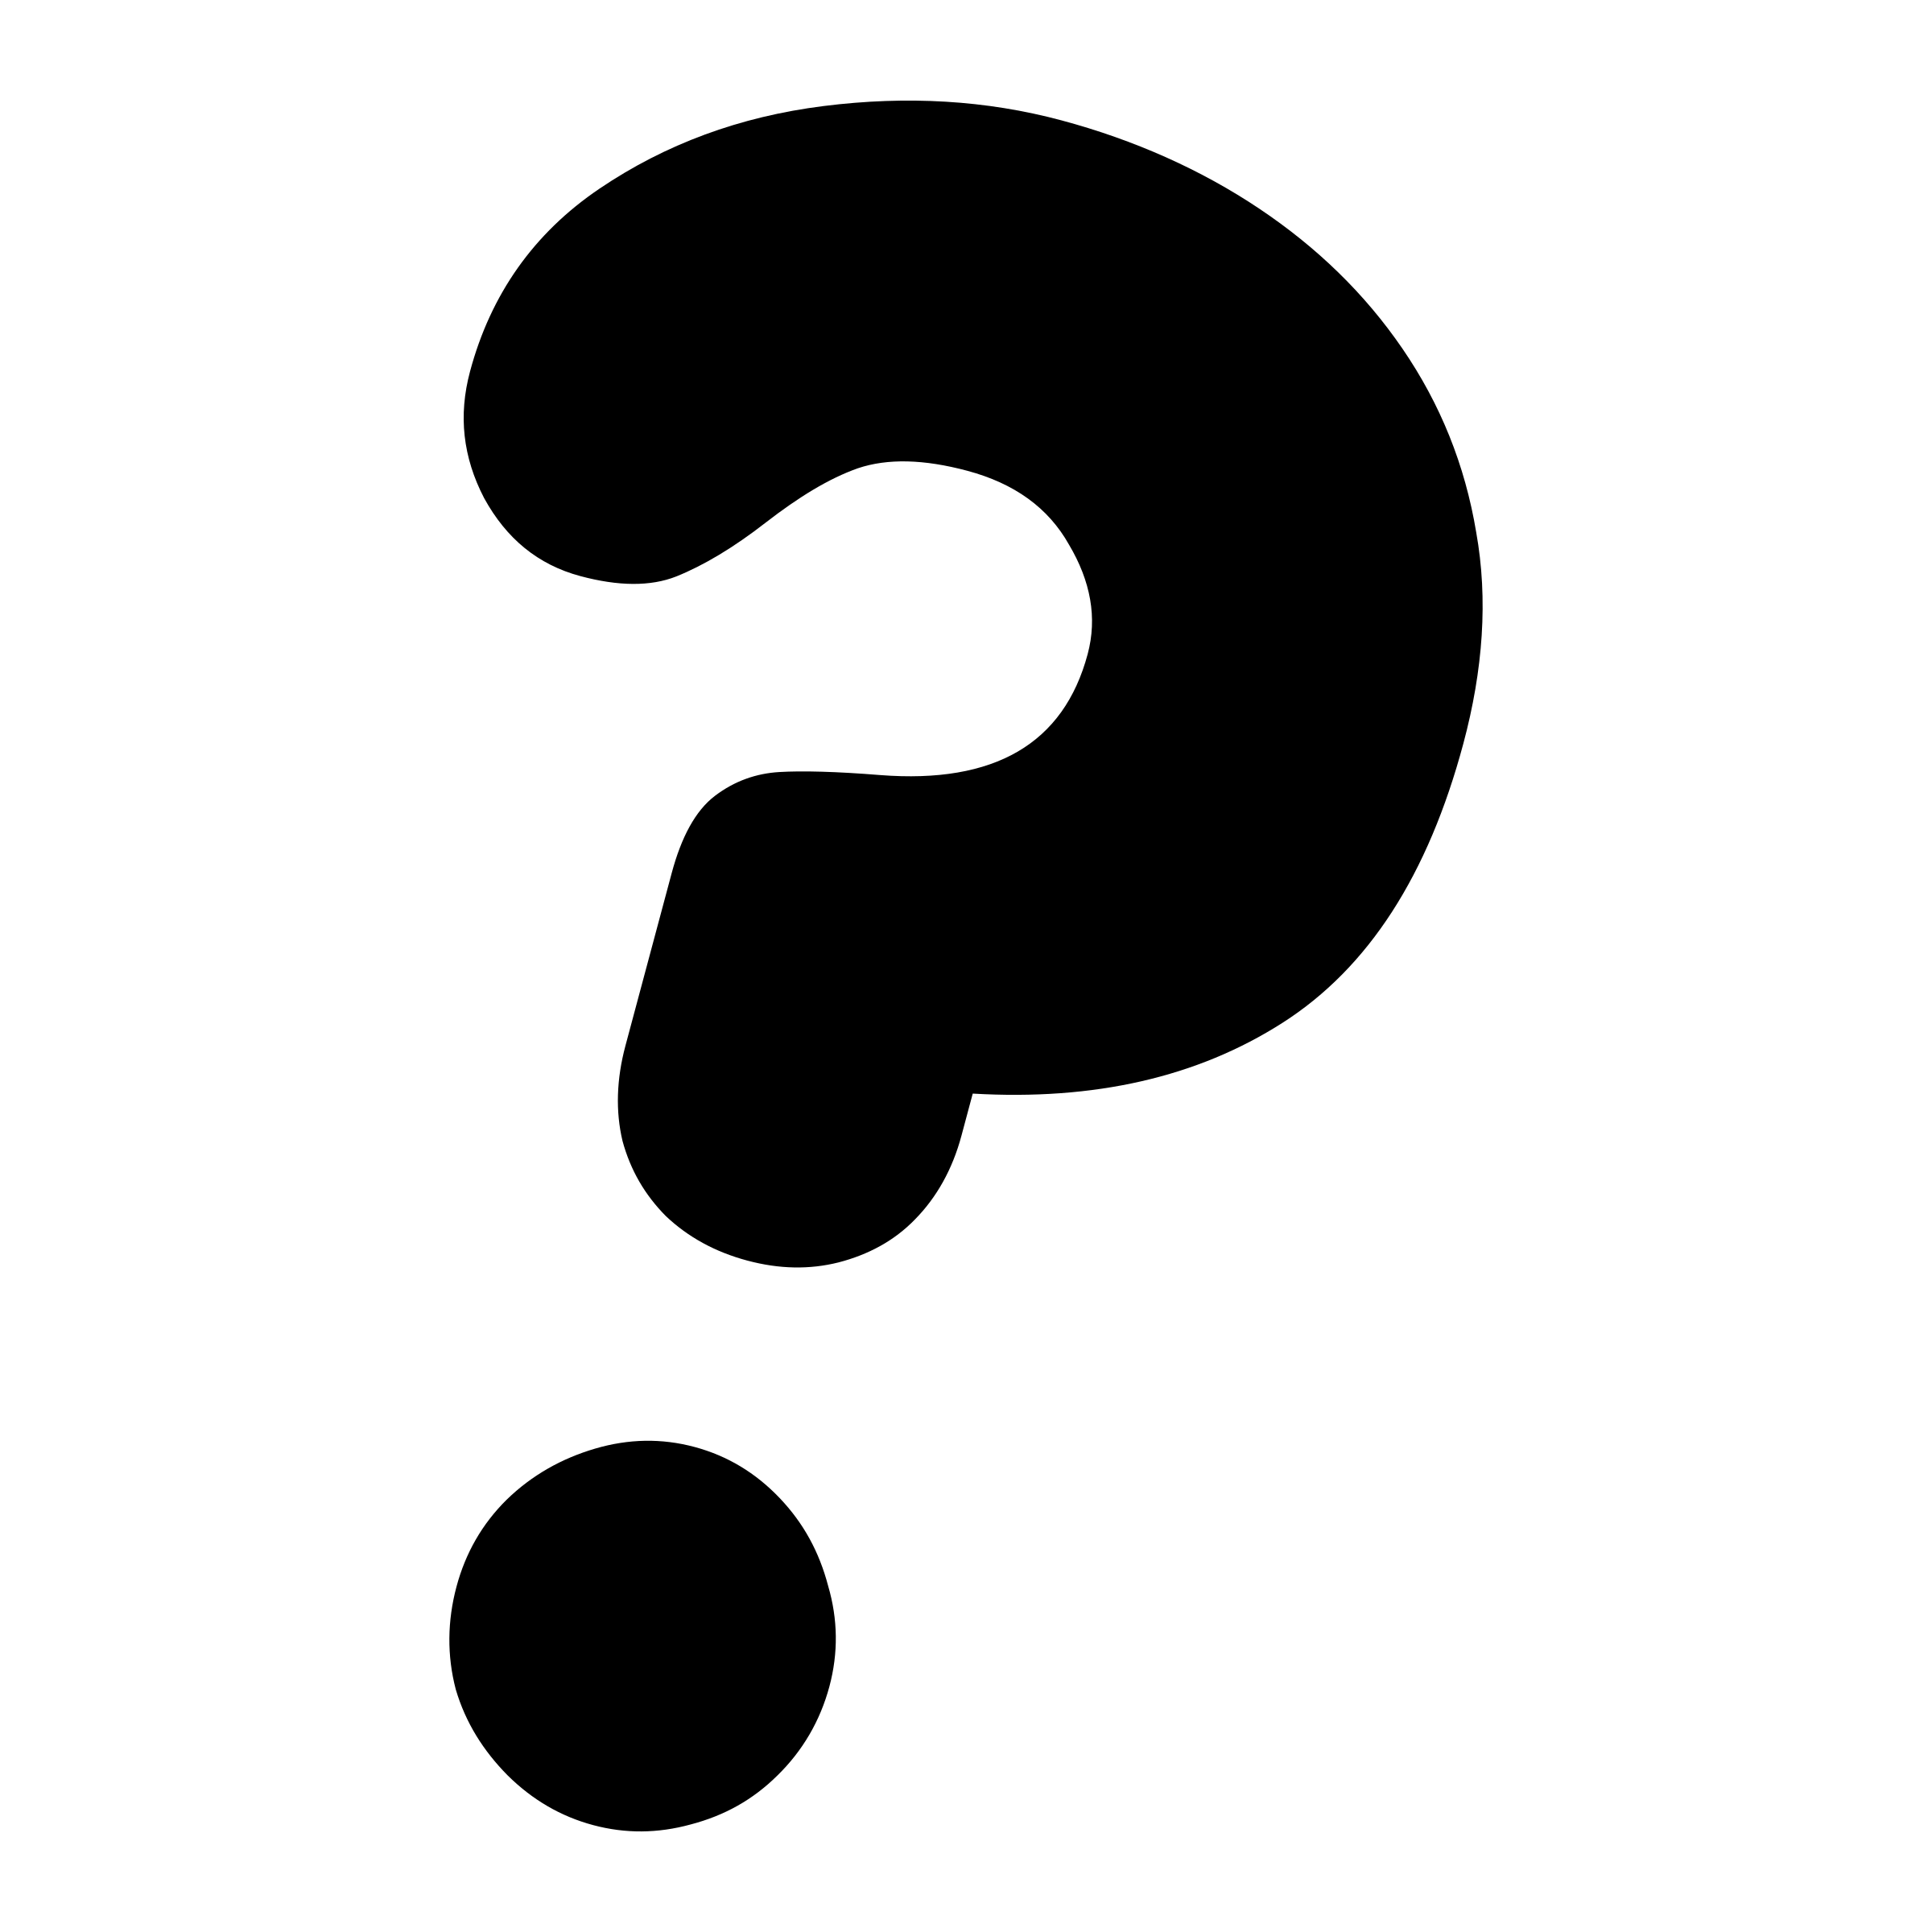 Question Mark clipart Clipartix for Free microsoft Clipart